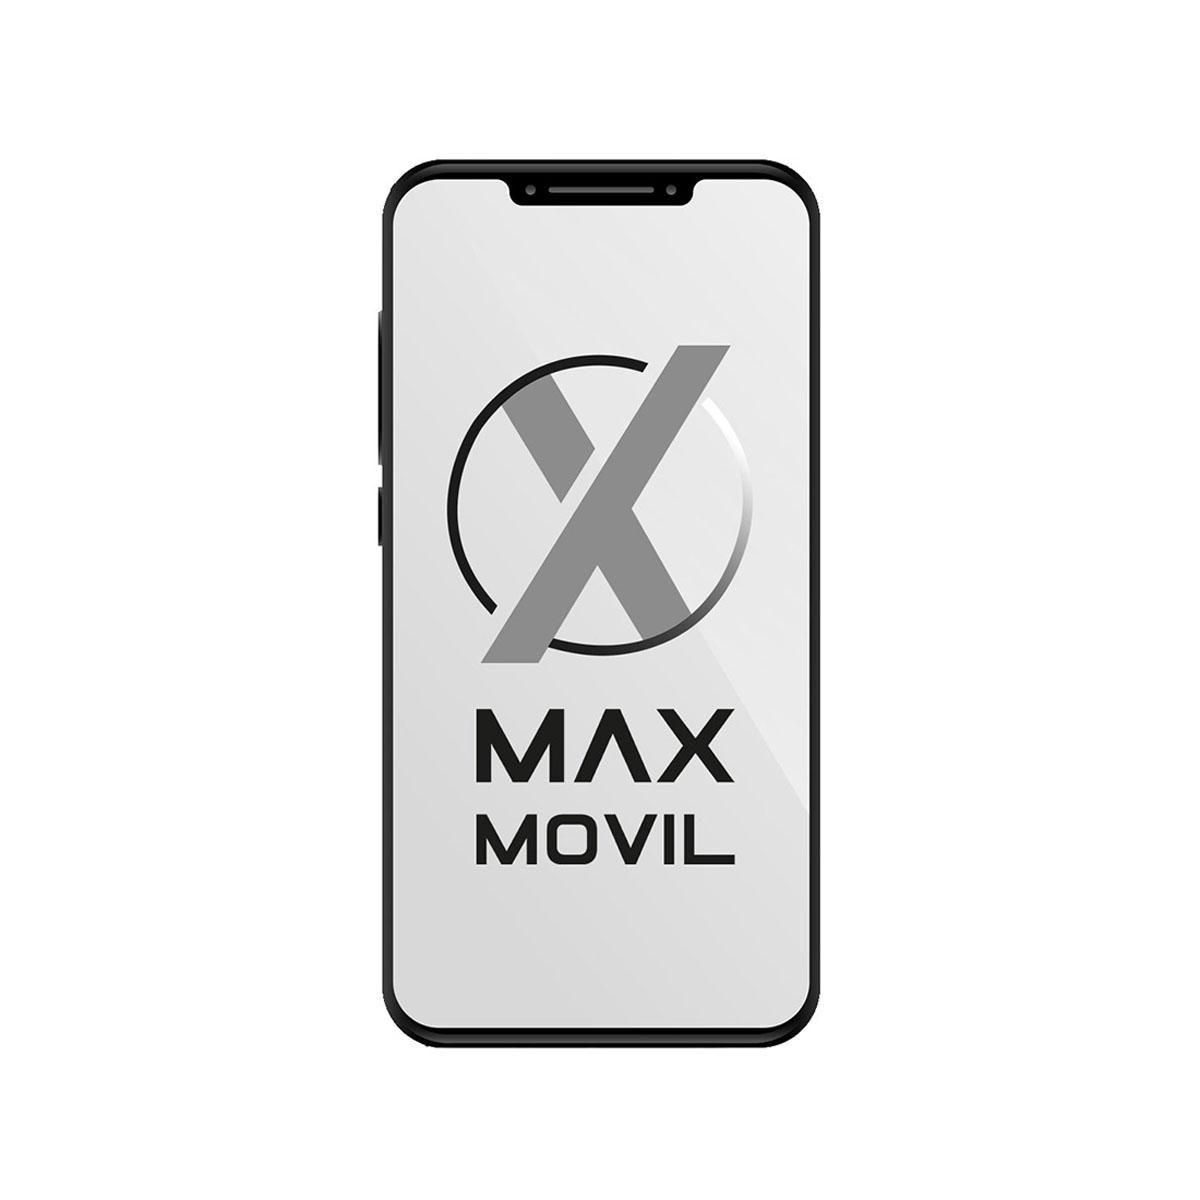 Funda Smart Cover blanca para Huawei MediaPad T1 10